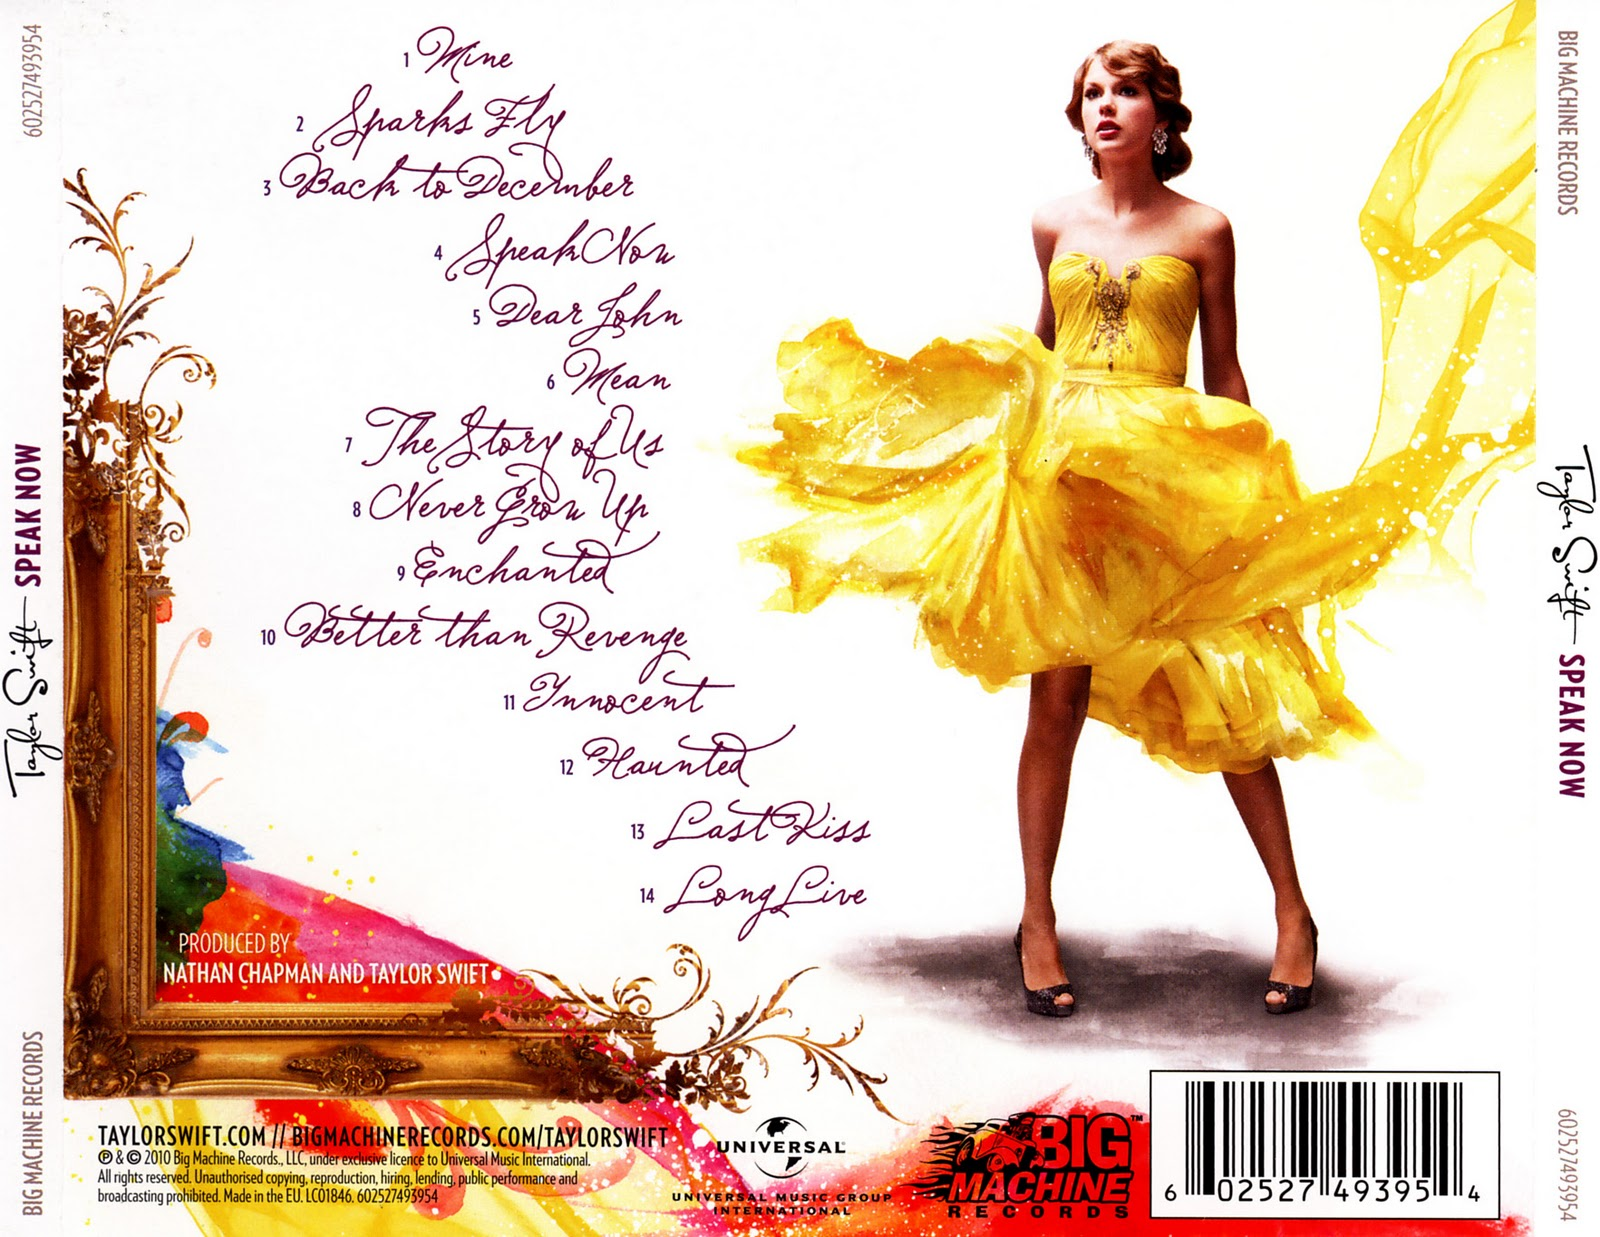 Taylor Swift Speak Now album cover back | sophiehibberd